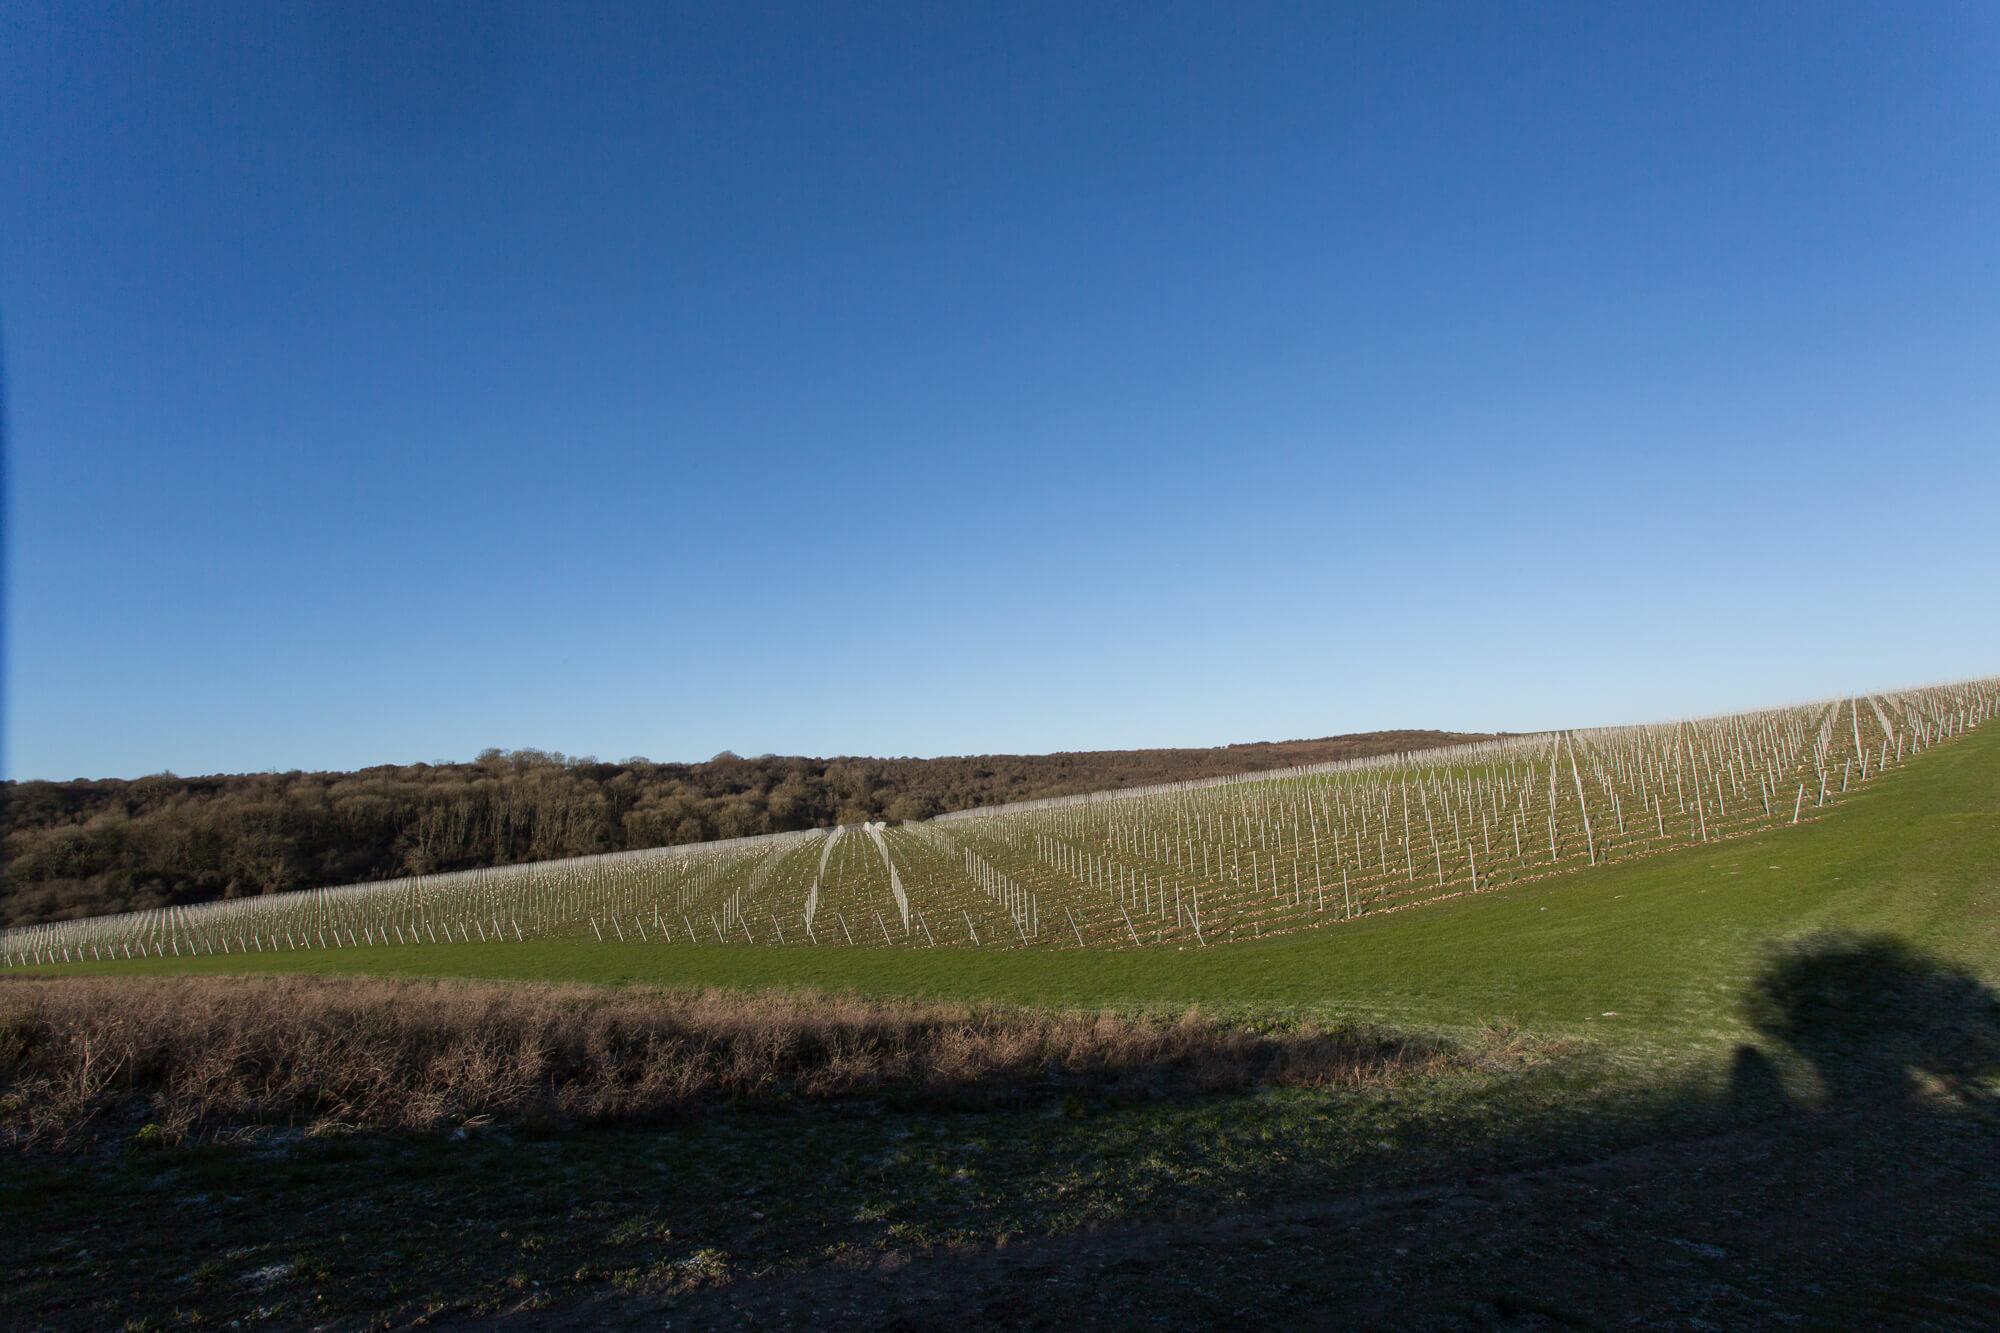 Blue Sky Over the Vineyard